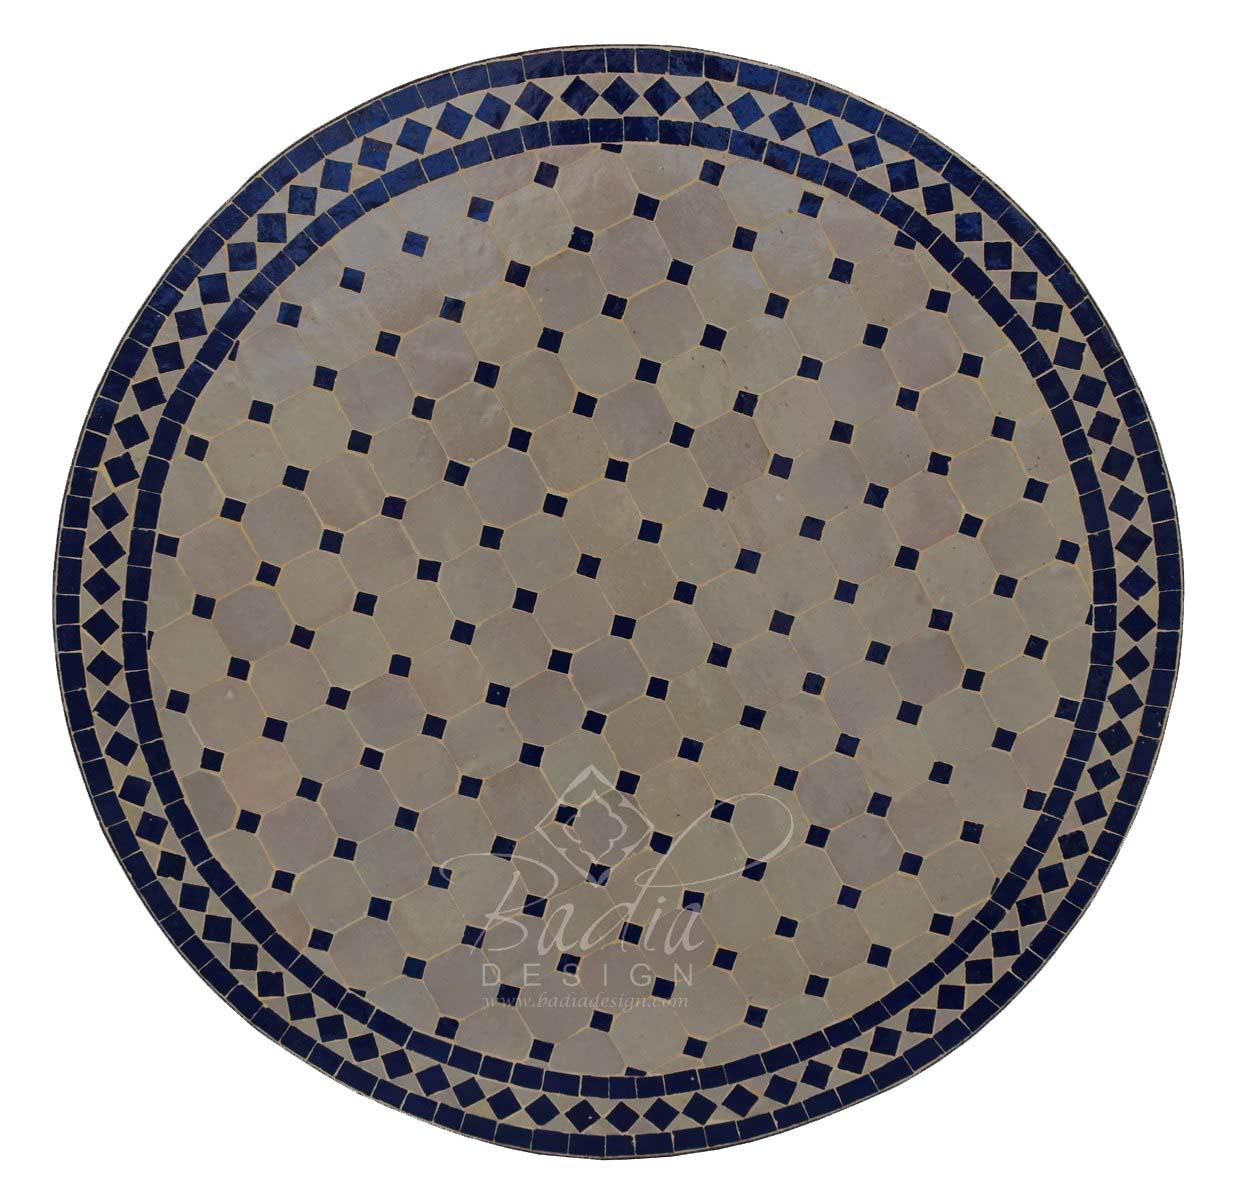 ceramic-tile-table-tops-los-angeles-mtr270a.jpg